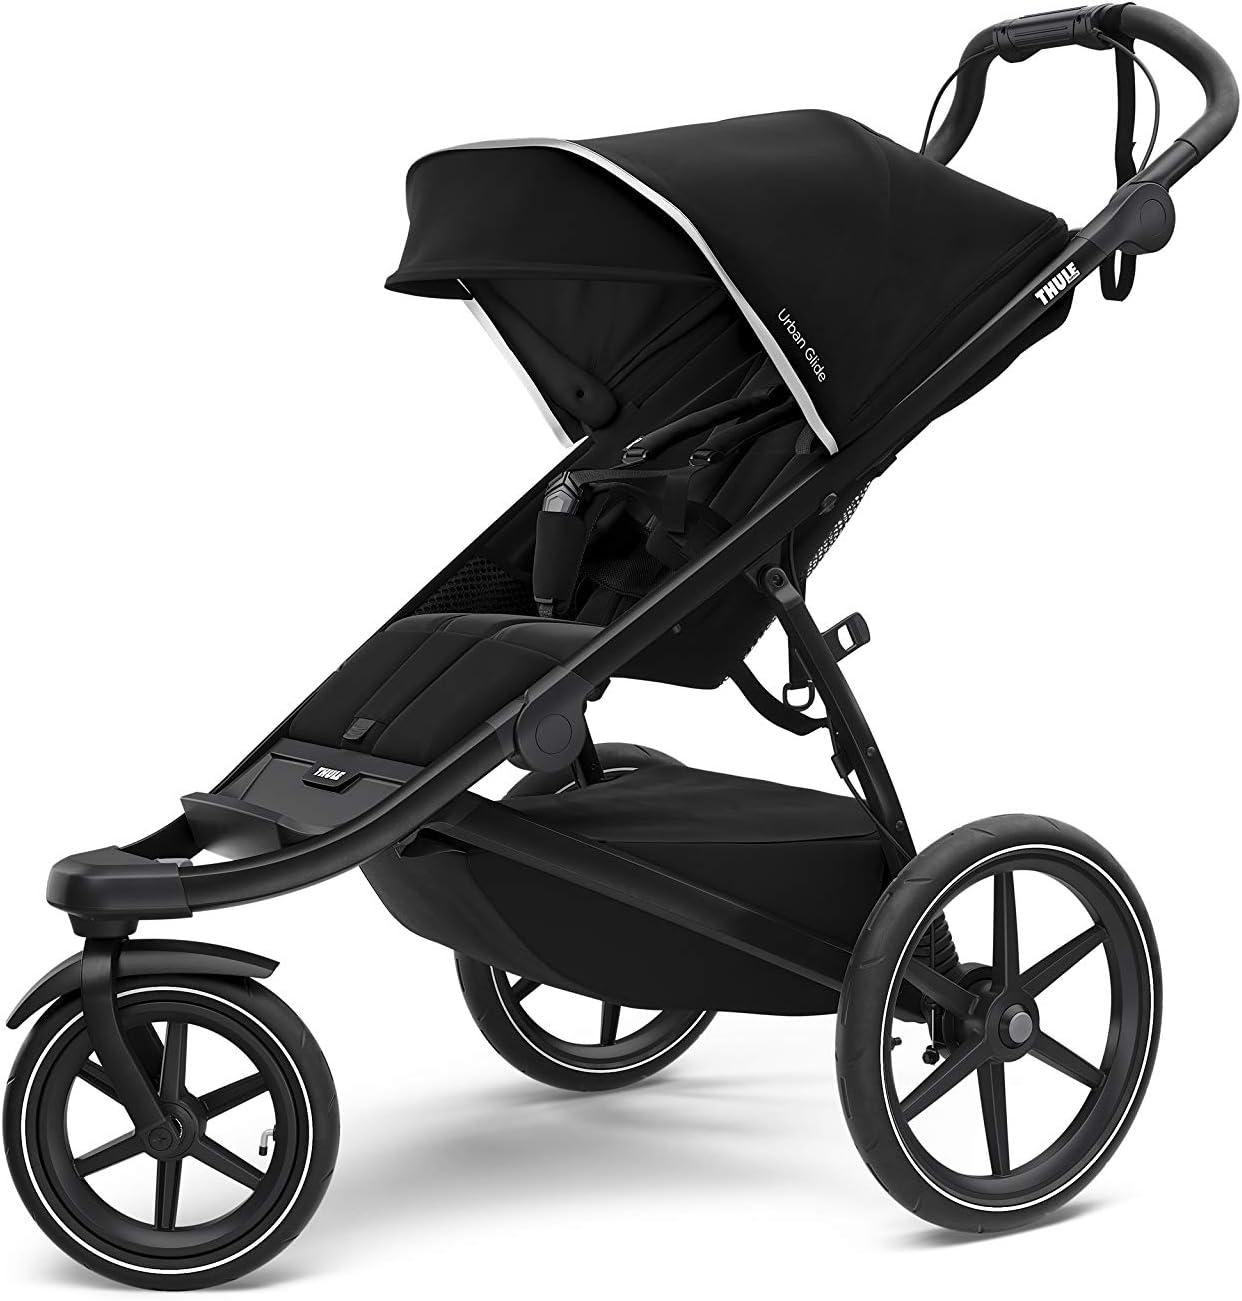 71Abiemznnl. Ac Sl1500 Strollers For Big Kids